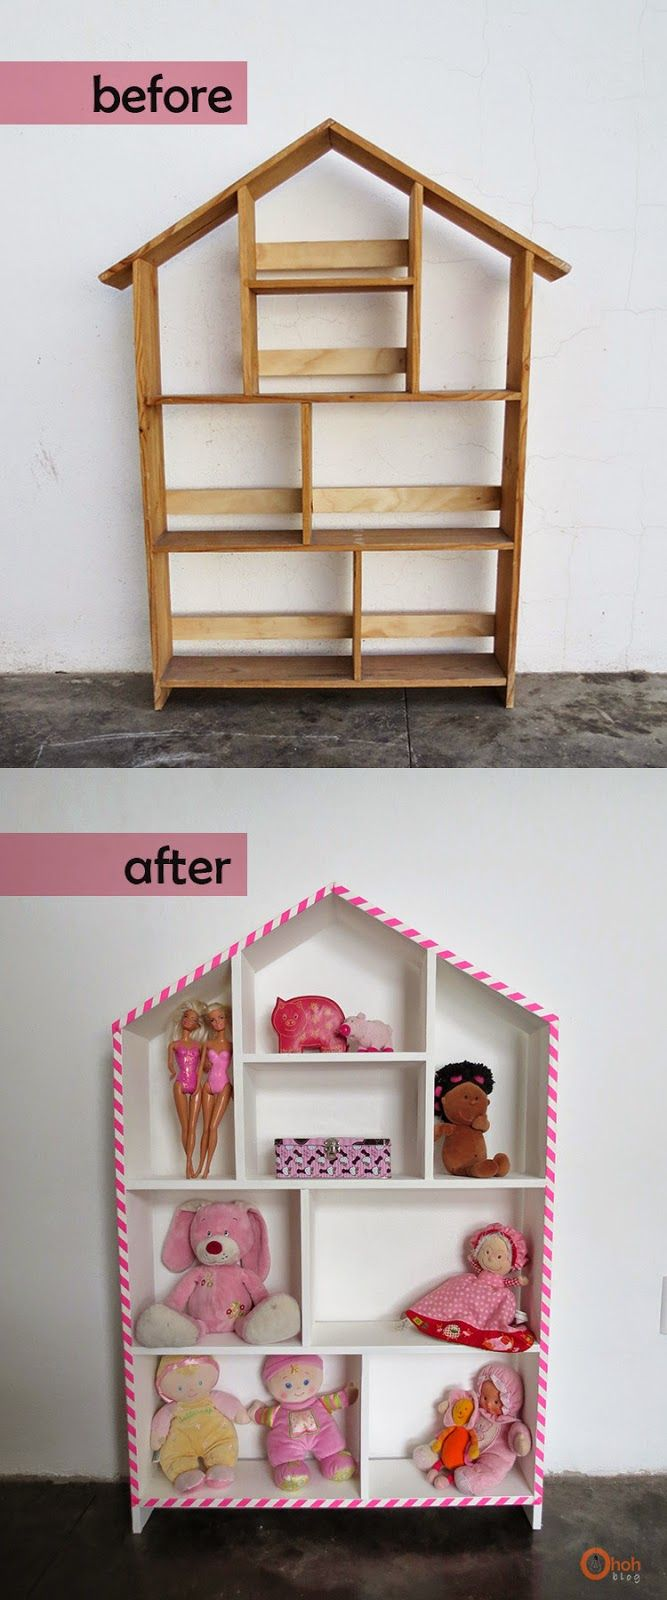 Ohoh Blog: House shelf makeover #storage #shelf #beforeafter